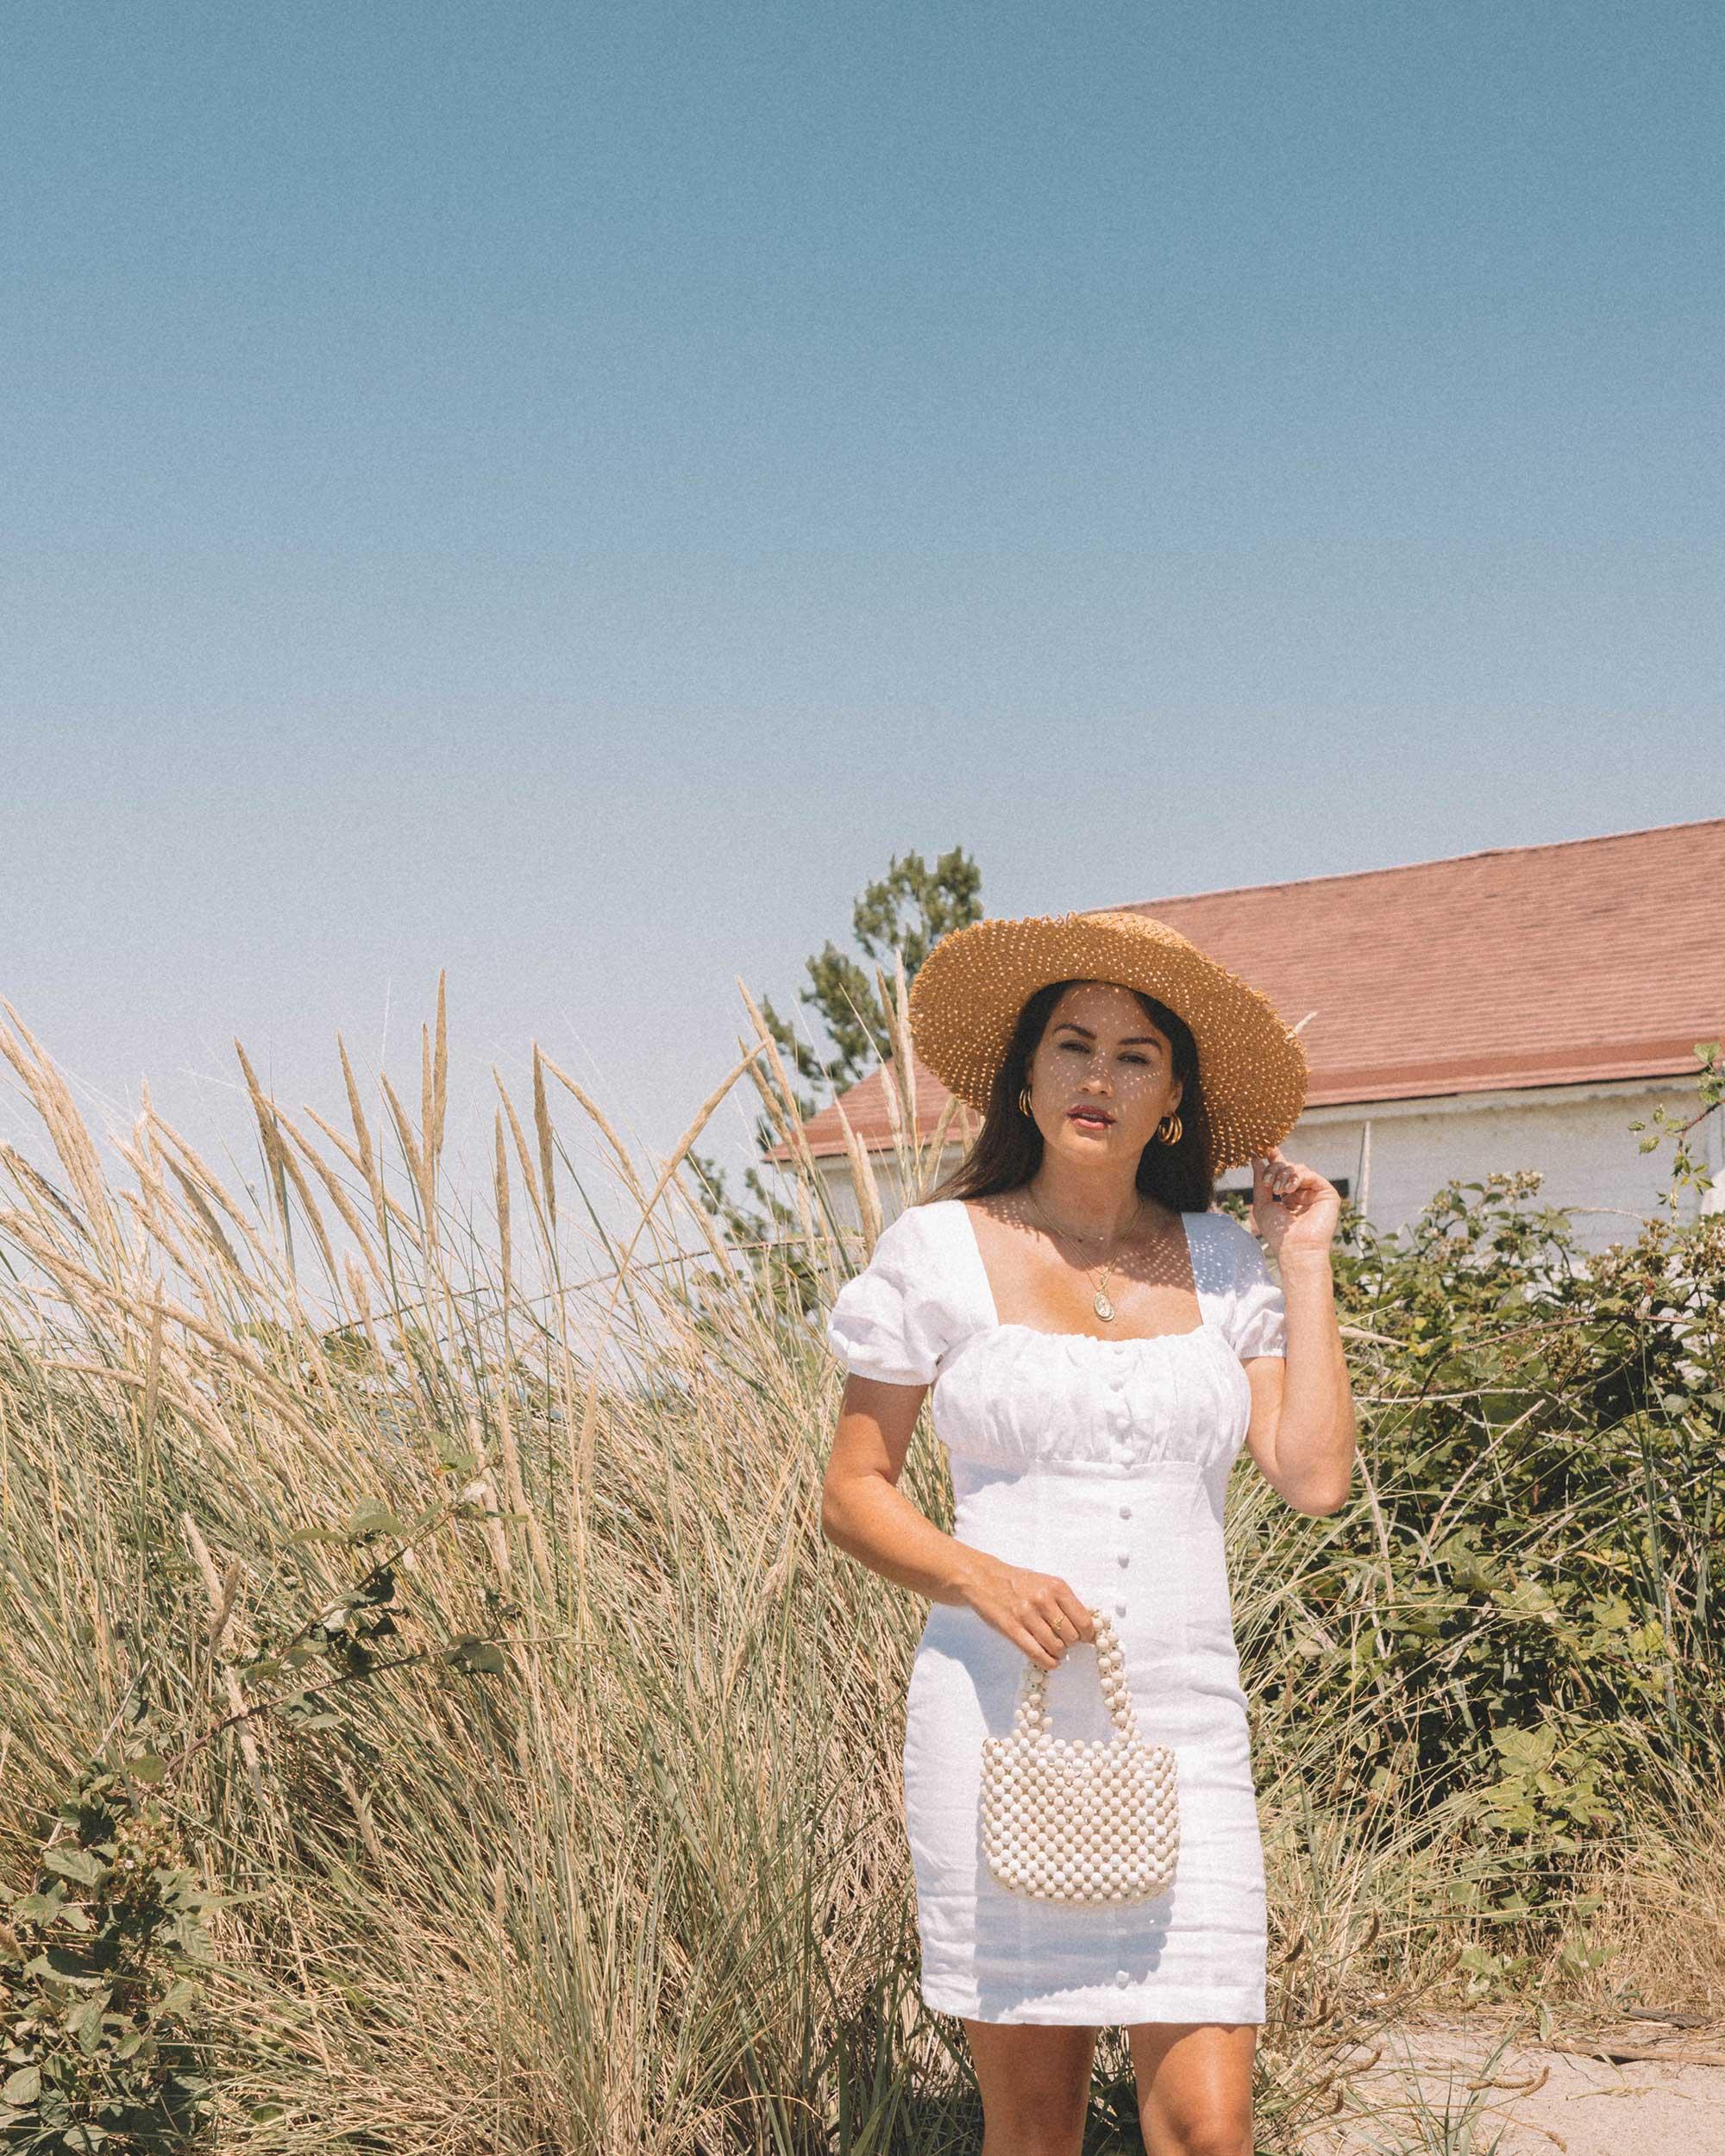 Sarah Butler of Sarah Styles wearing Puff Sleeve Linen Minidress at Seattle Discover Park  | @sarahchristine -1.jpg